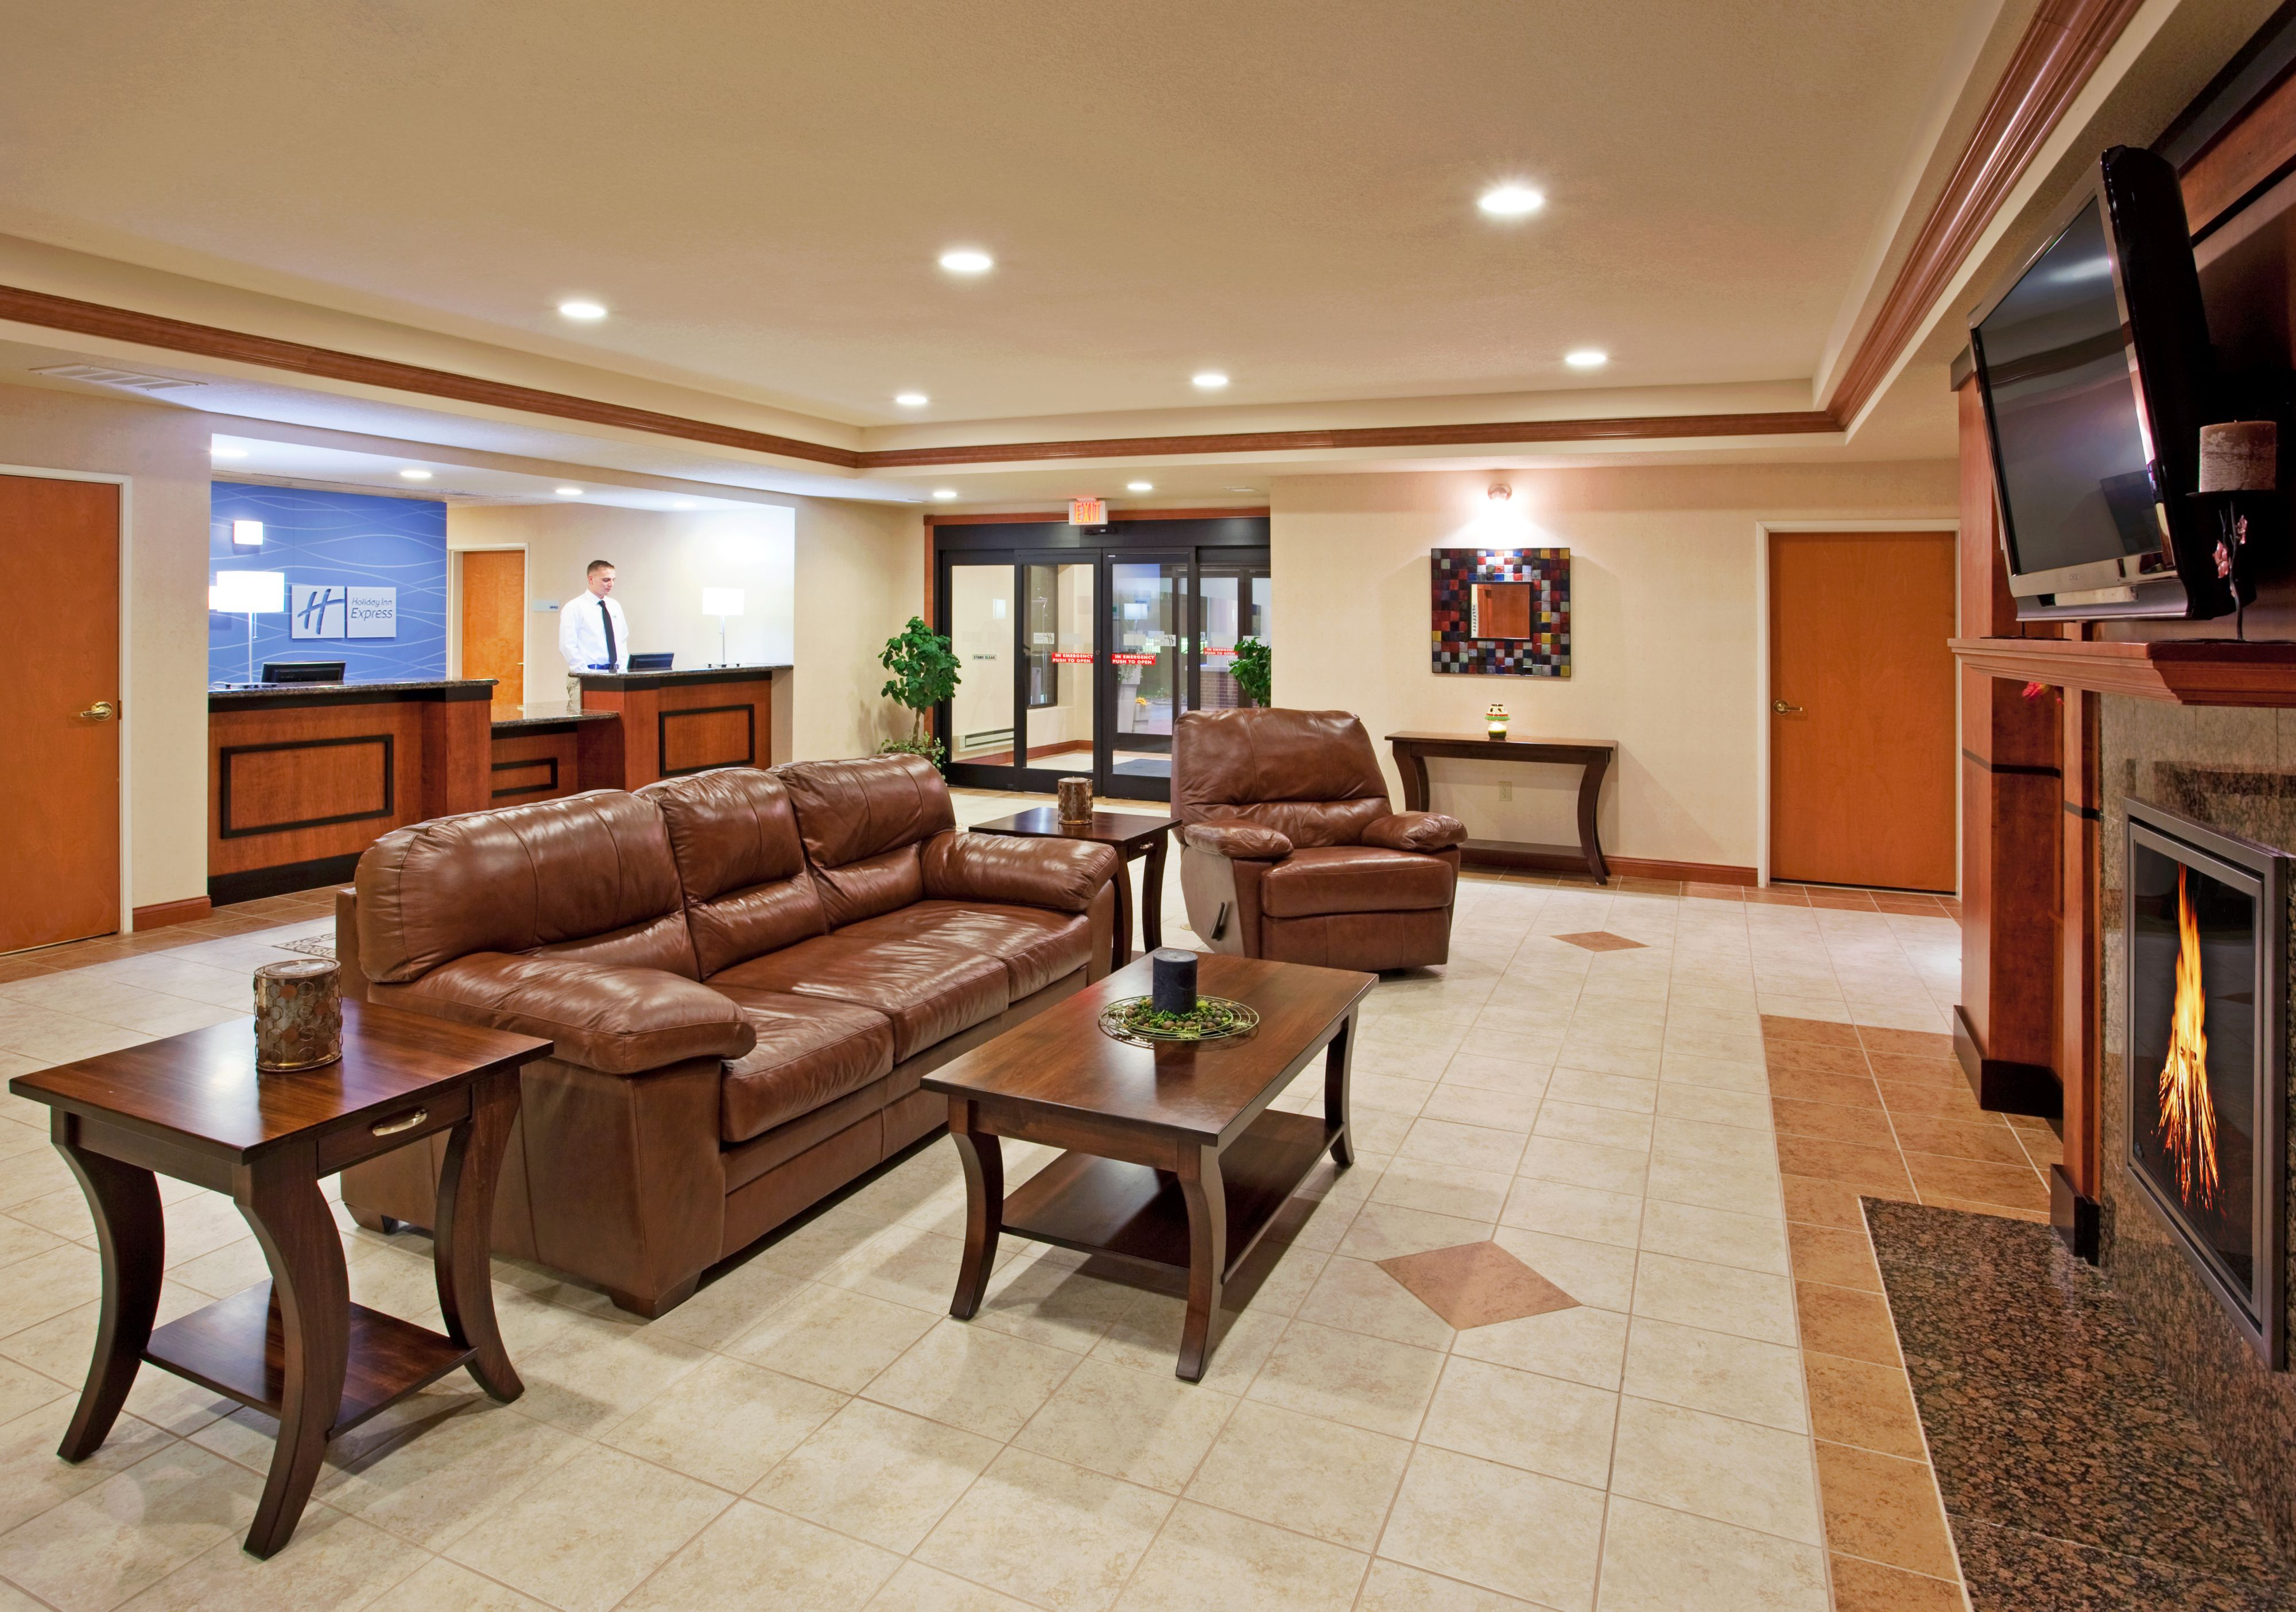 Holiday Inn Express & Suites East Lansing image 6